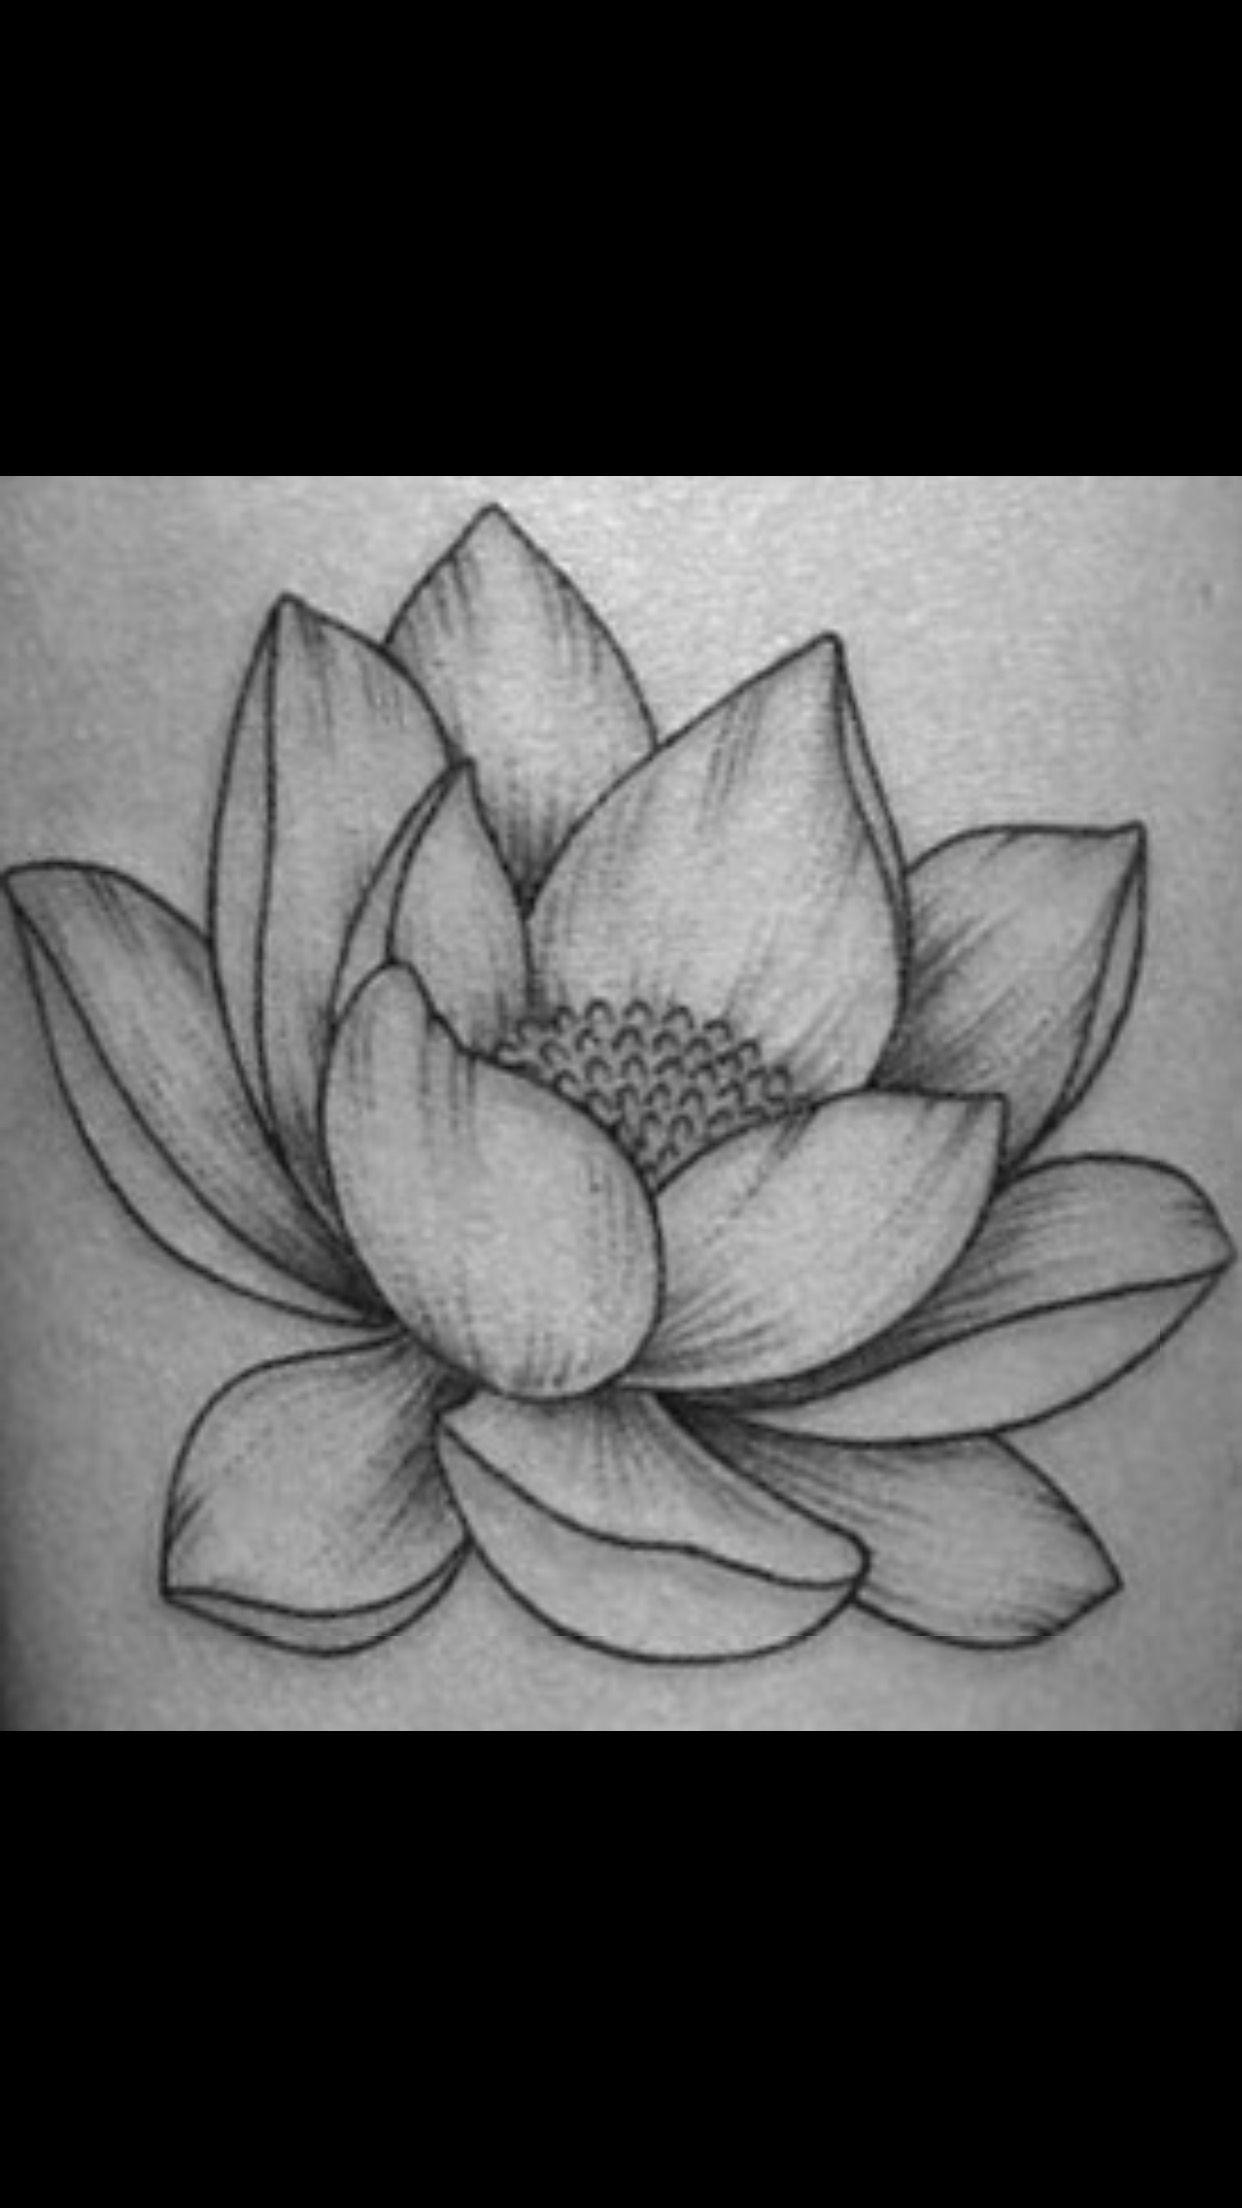 Realistic Lotus Drawing : realistic, lotus, drawing, Lotus, Flower, Drawing, Realistic, Drawing,, Pencil, Drawings, Flowers,